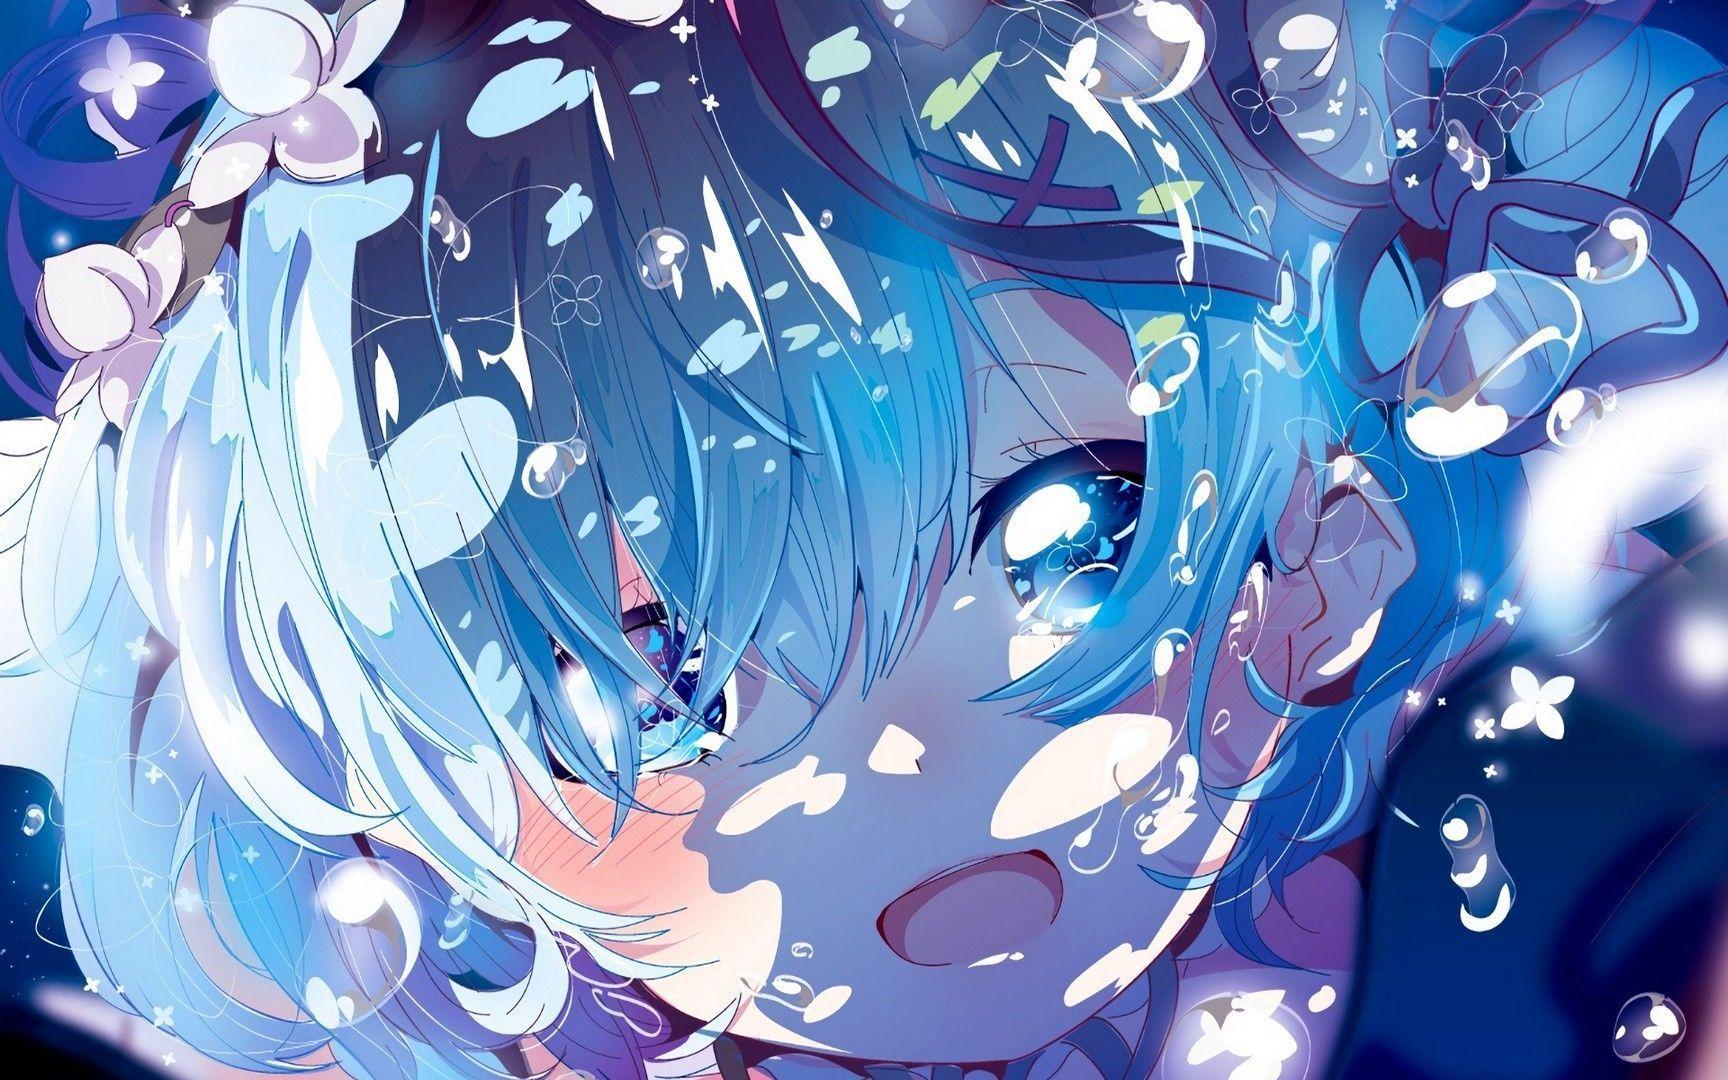 Anime Wallpaper Hd Pic 風